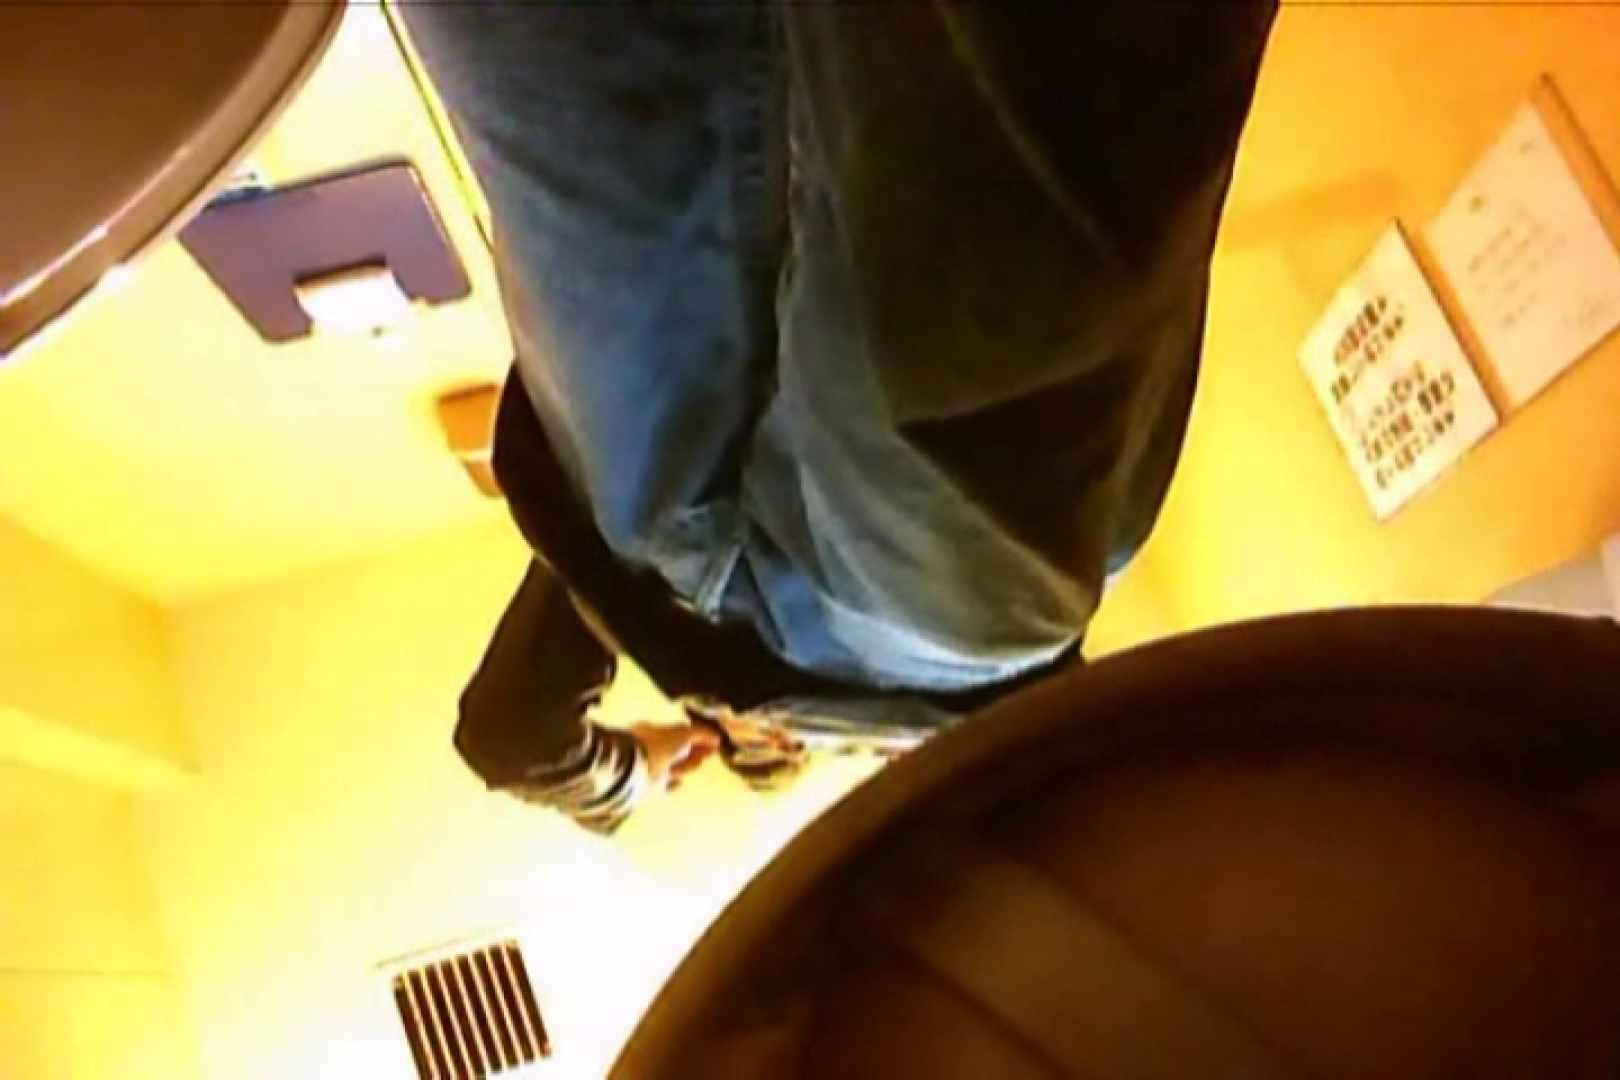 SEASON 2ND!掴み取りさんの洗面所覗き!in新幹線!VOL.03 覗きお宝 ゲイセックス画像 84連発 76